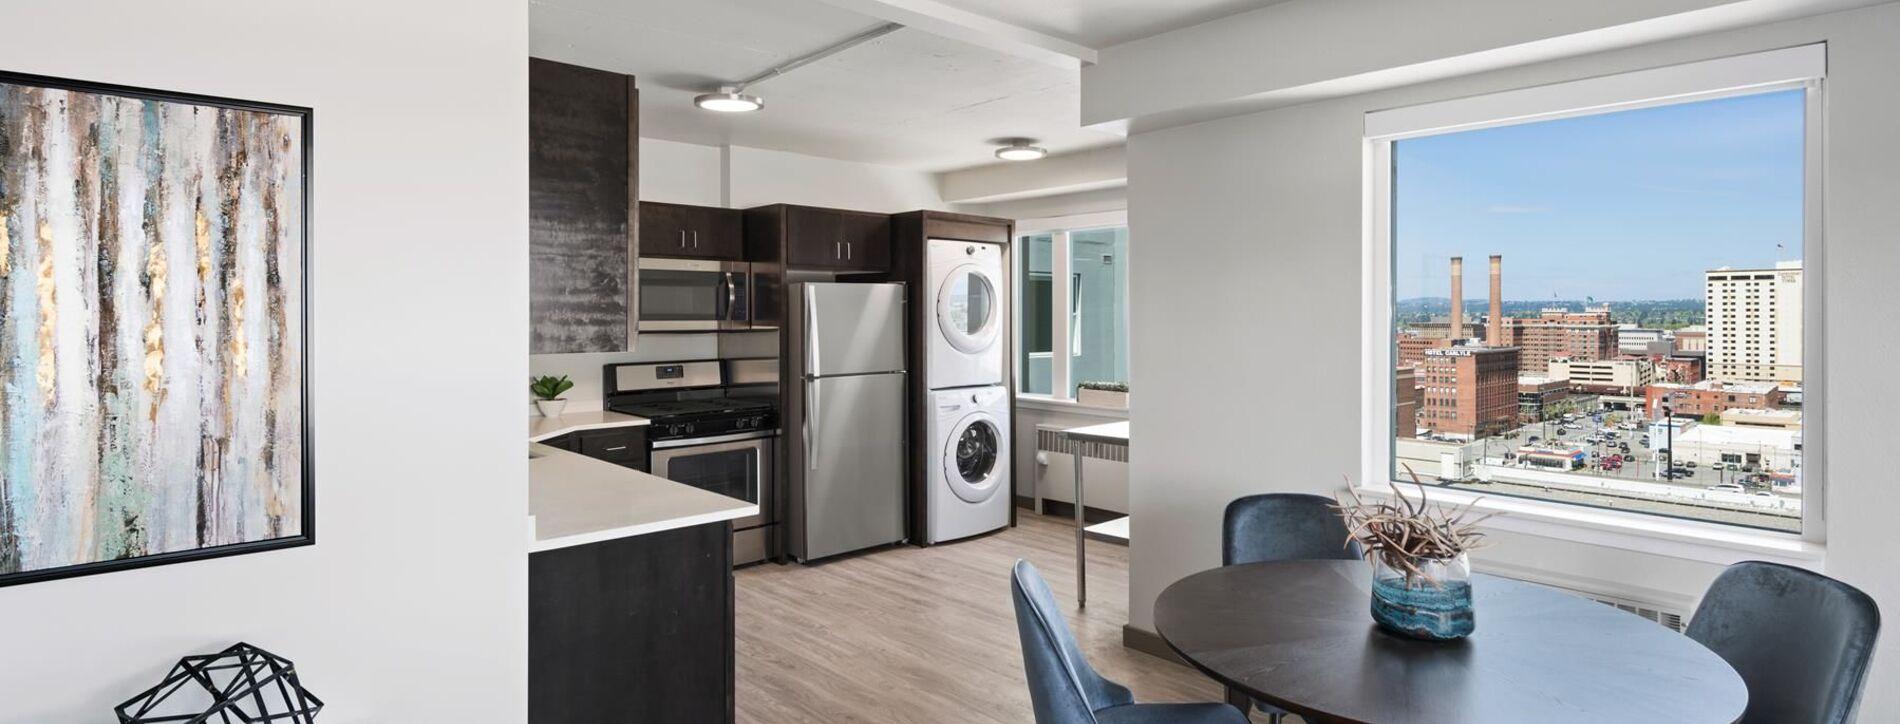 Downtown Spokane Apartments WA | Cooper George